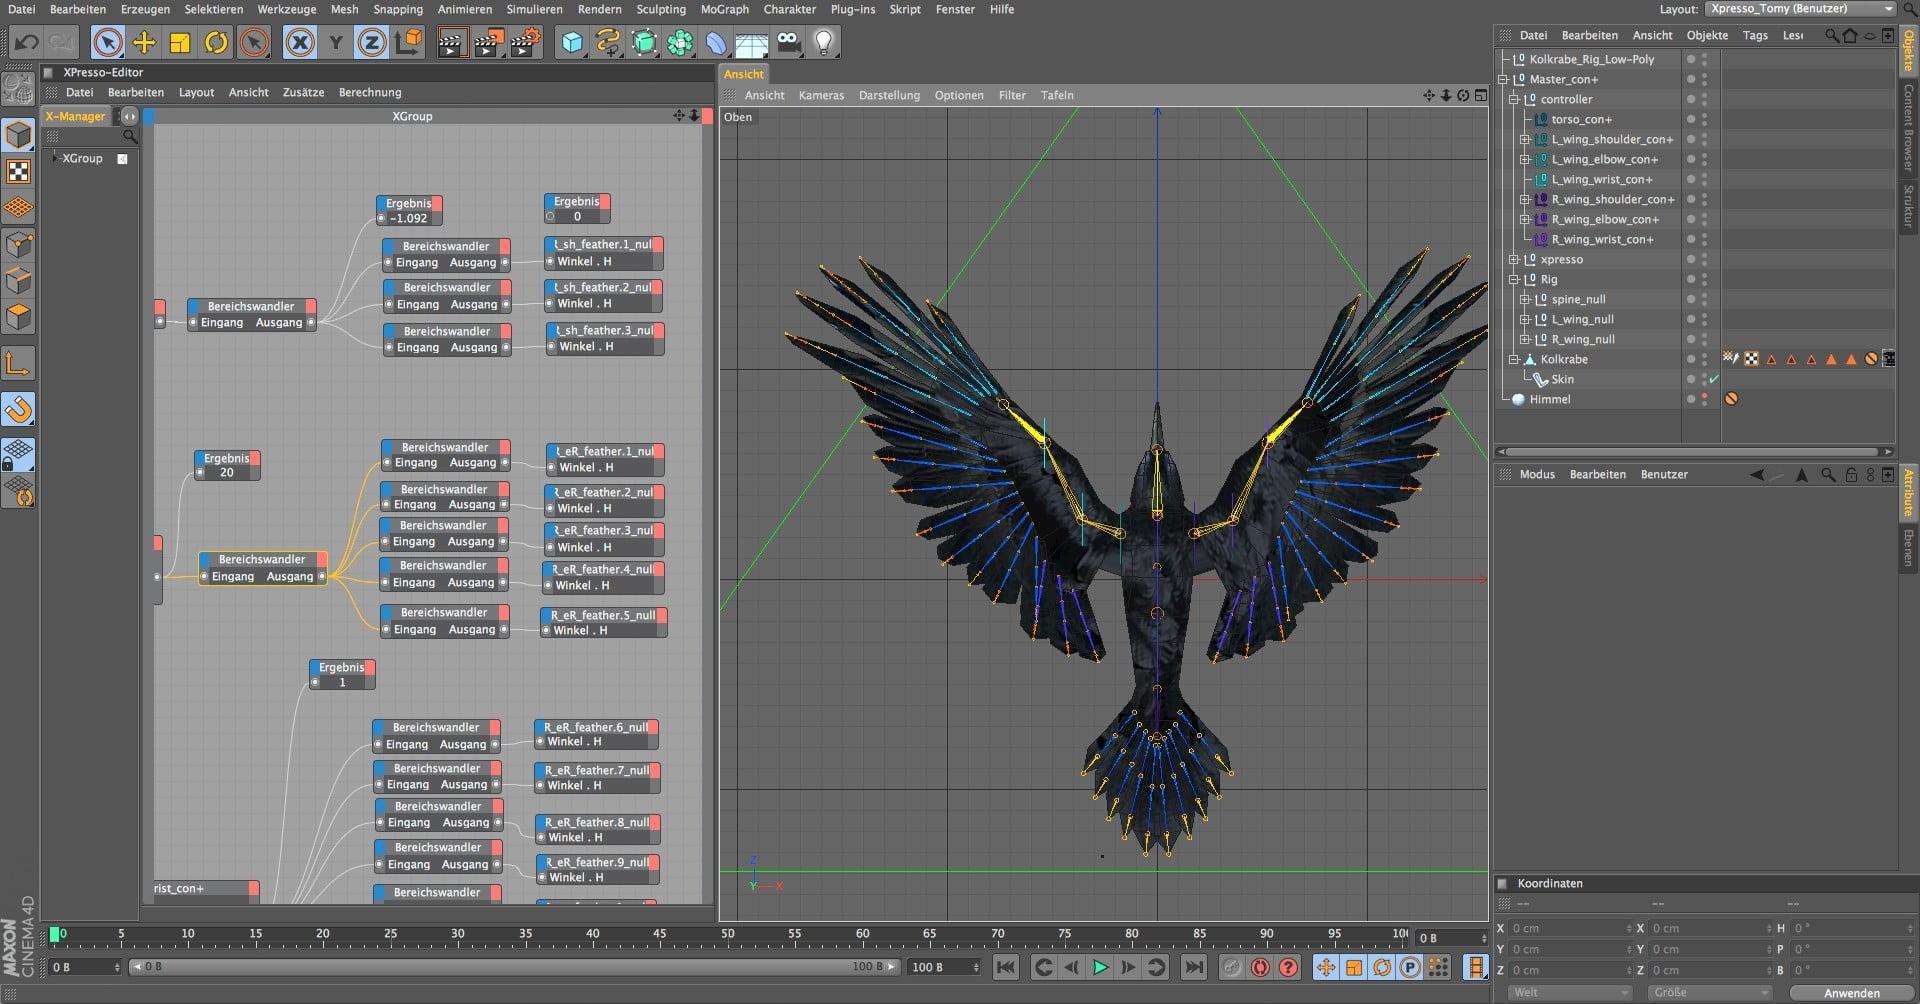 Kolkrabe Rig 2, birdly, ikonaut